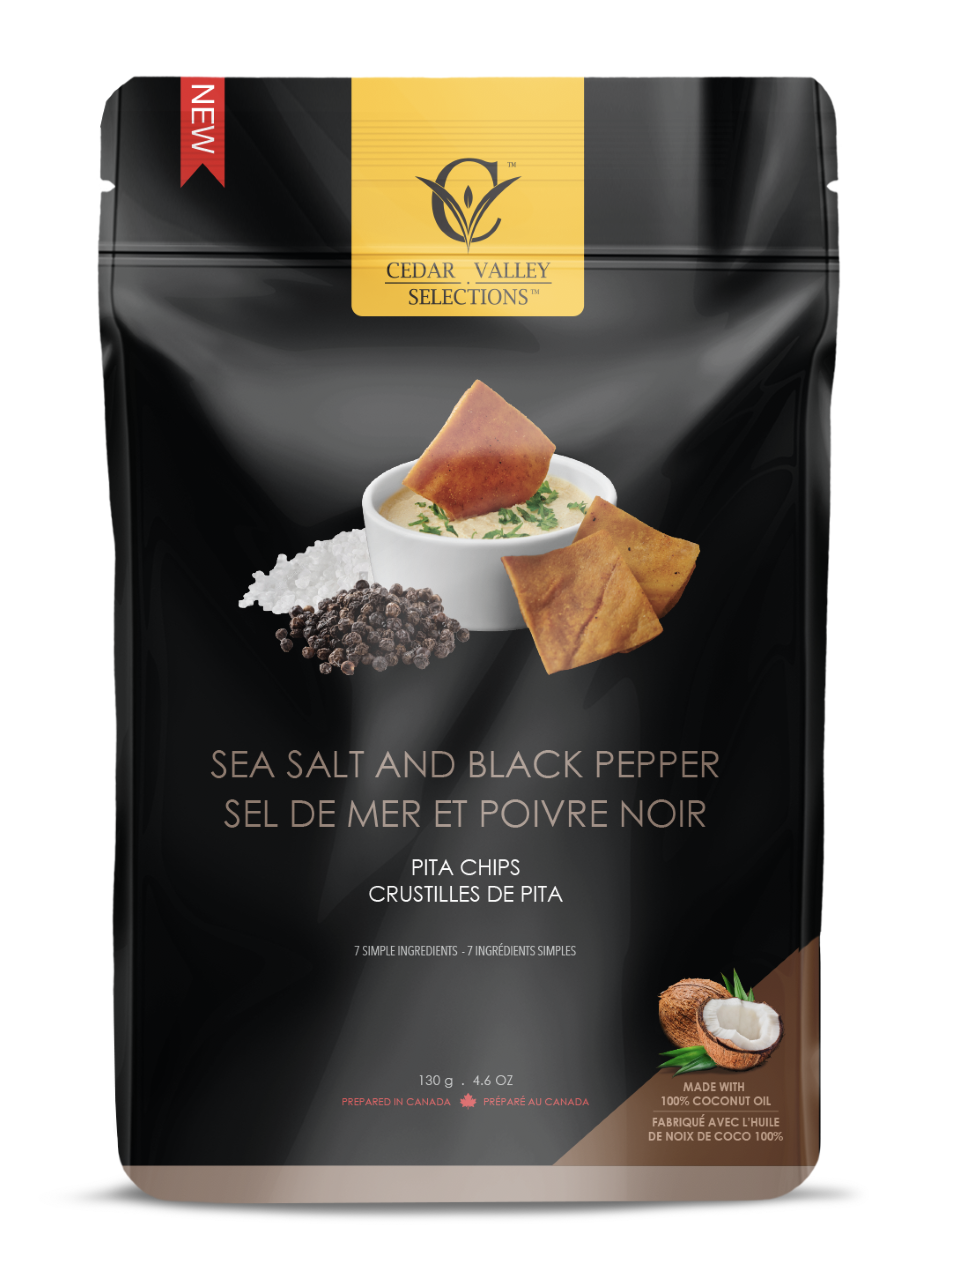 Cedar Valley - Sea Salt & Black Pepper Pita Chips